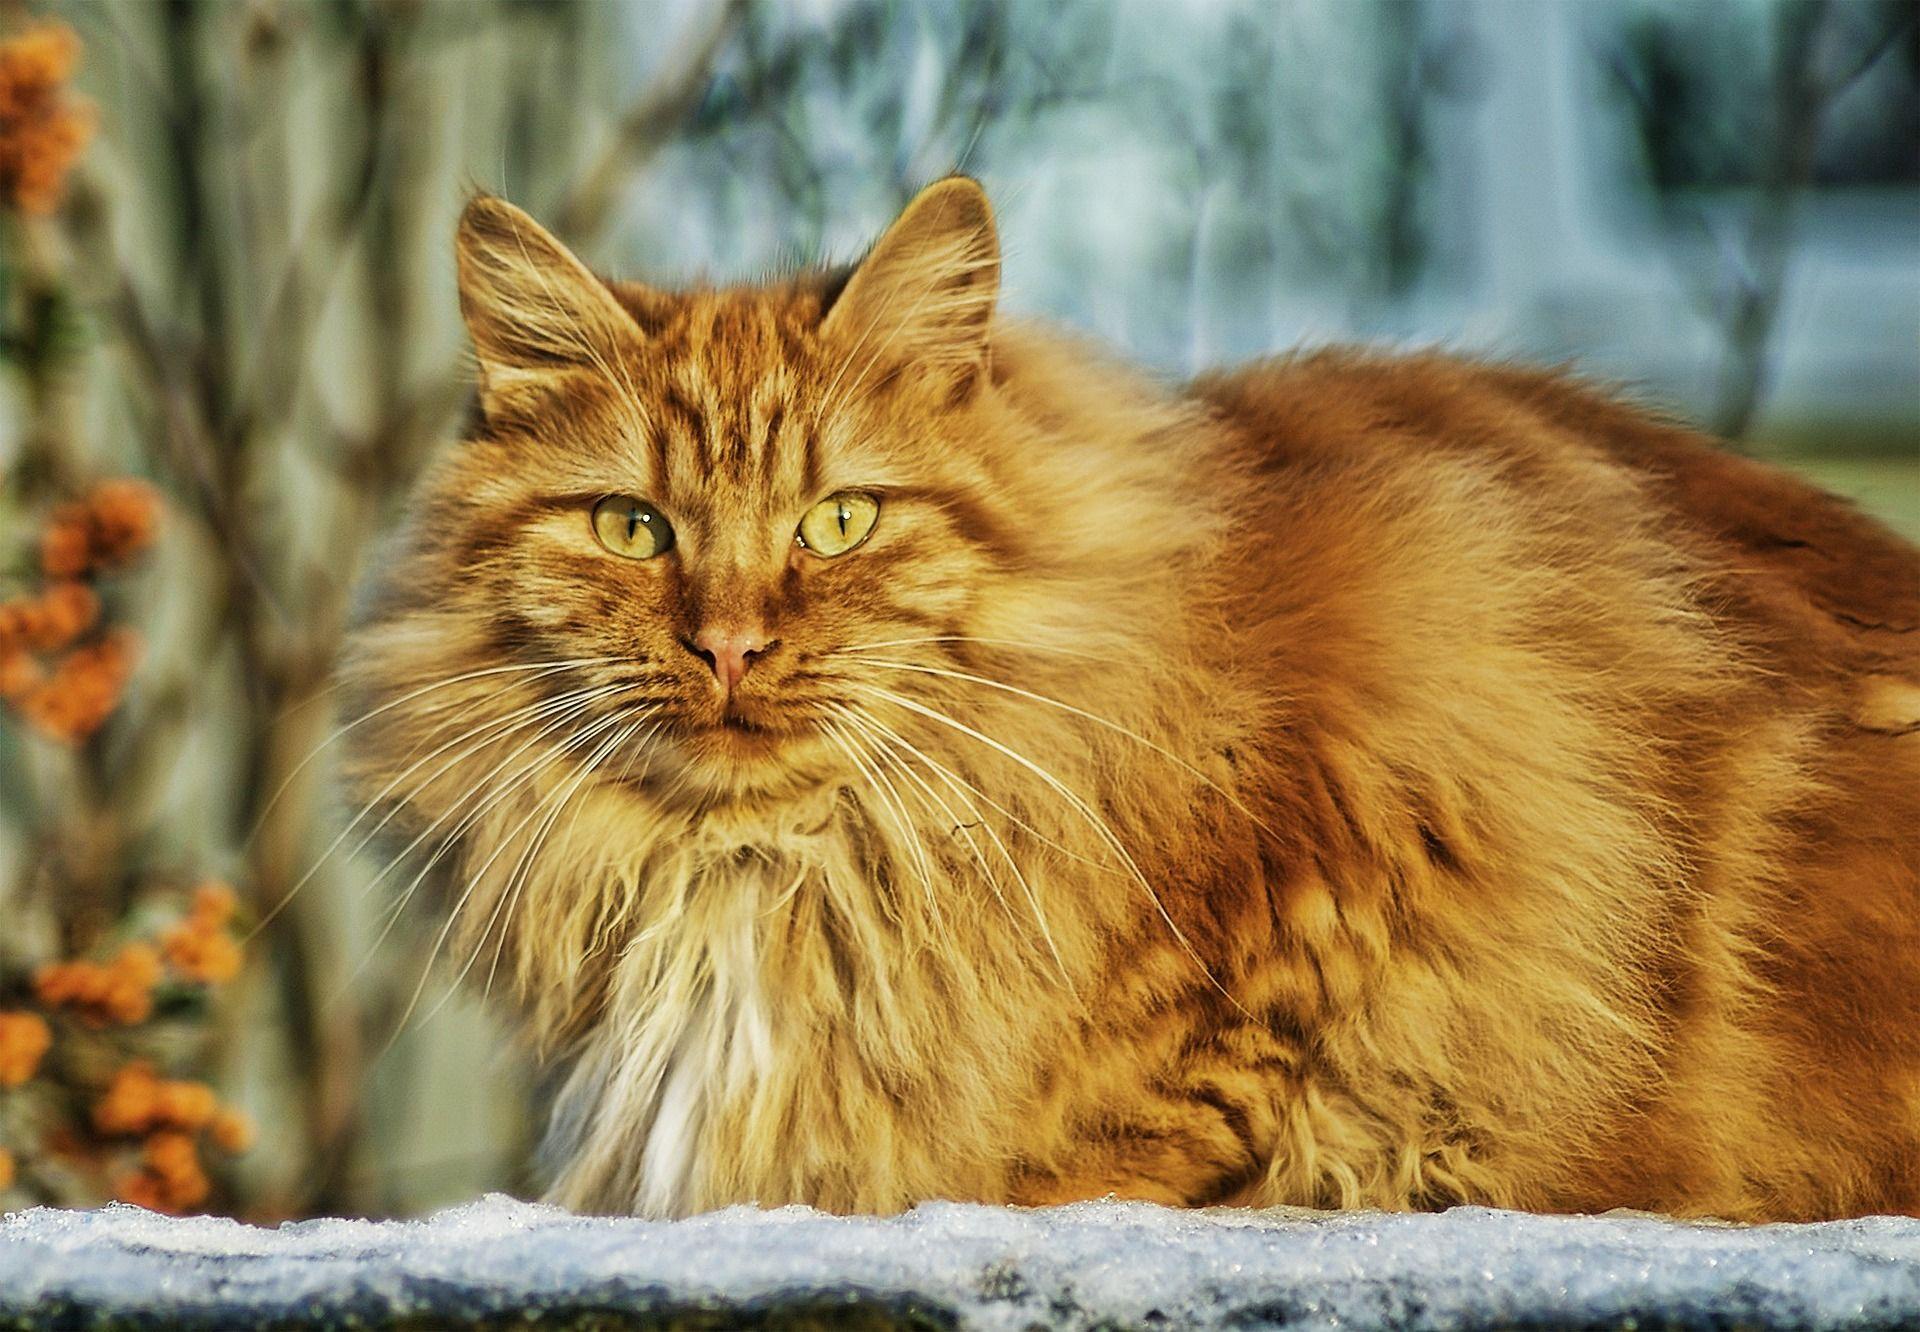 Taste of the Wild (USA),Tundra (Canadá), Sunday Pets, etc.